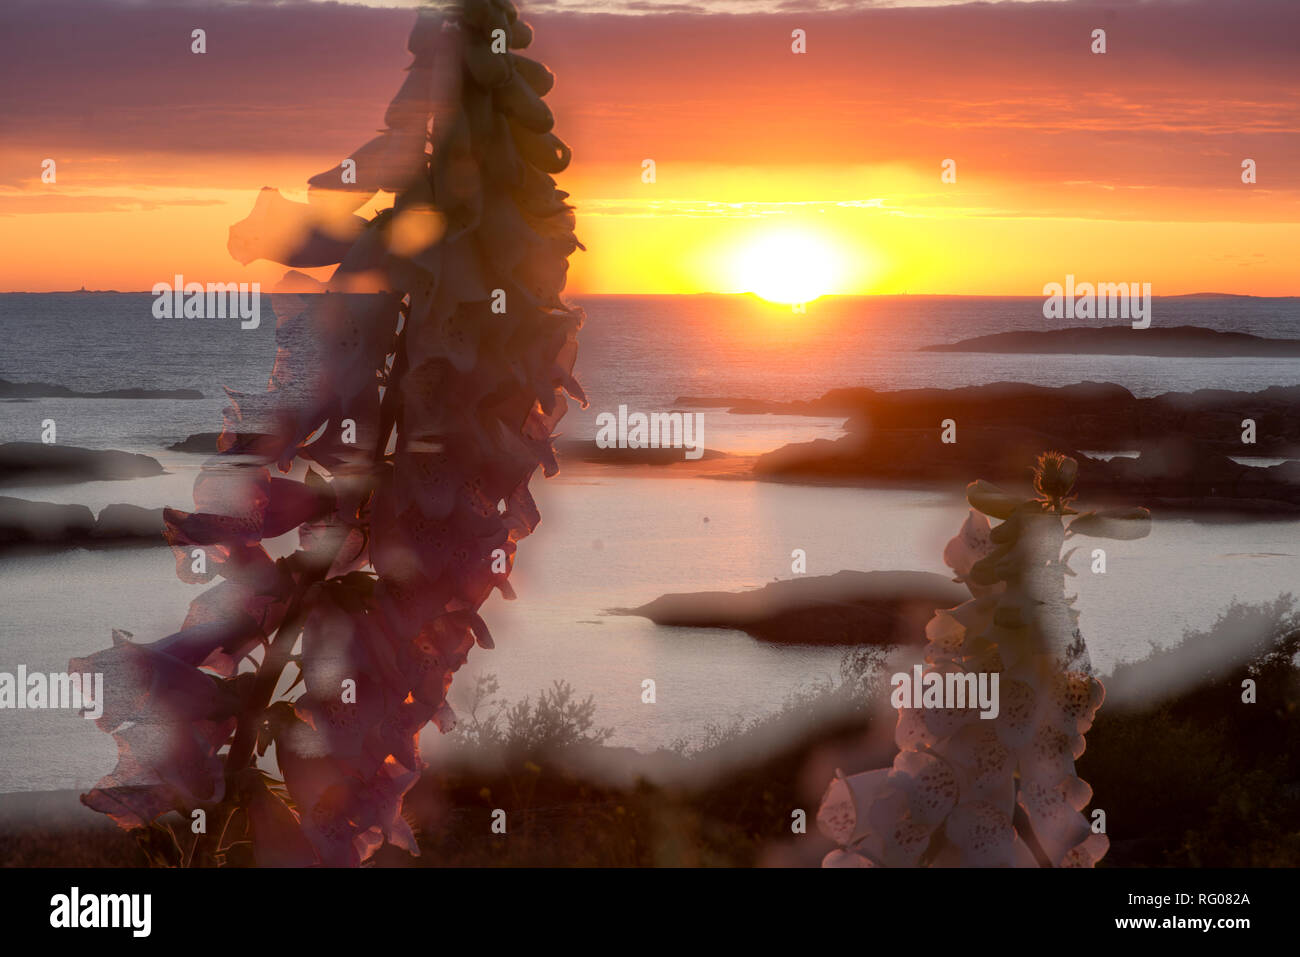 SWEDEN, Plant, photosynthetic, eukaryotes, Plantae,  multicellular, flowering, plants, gymnosperms, ferns, Green plants, photosynthesis, chloroplasts, - Stock Image